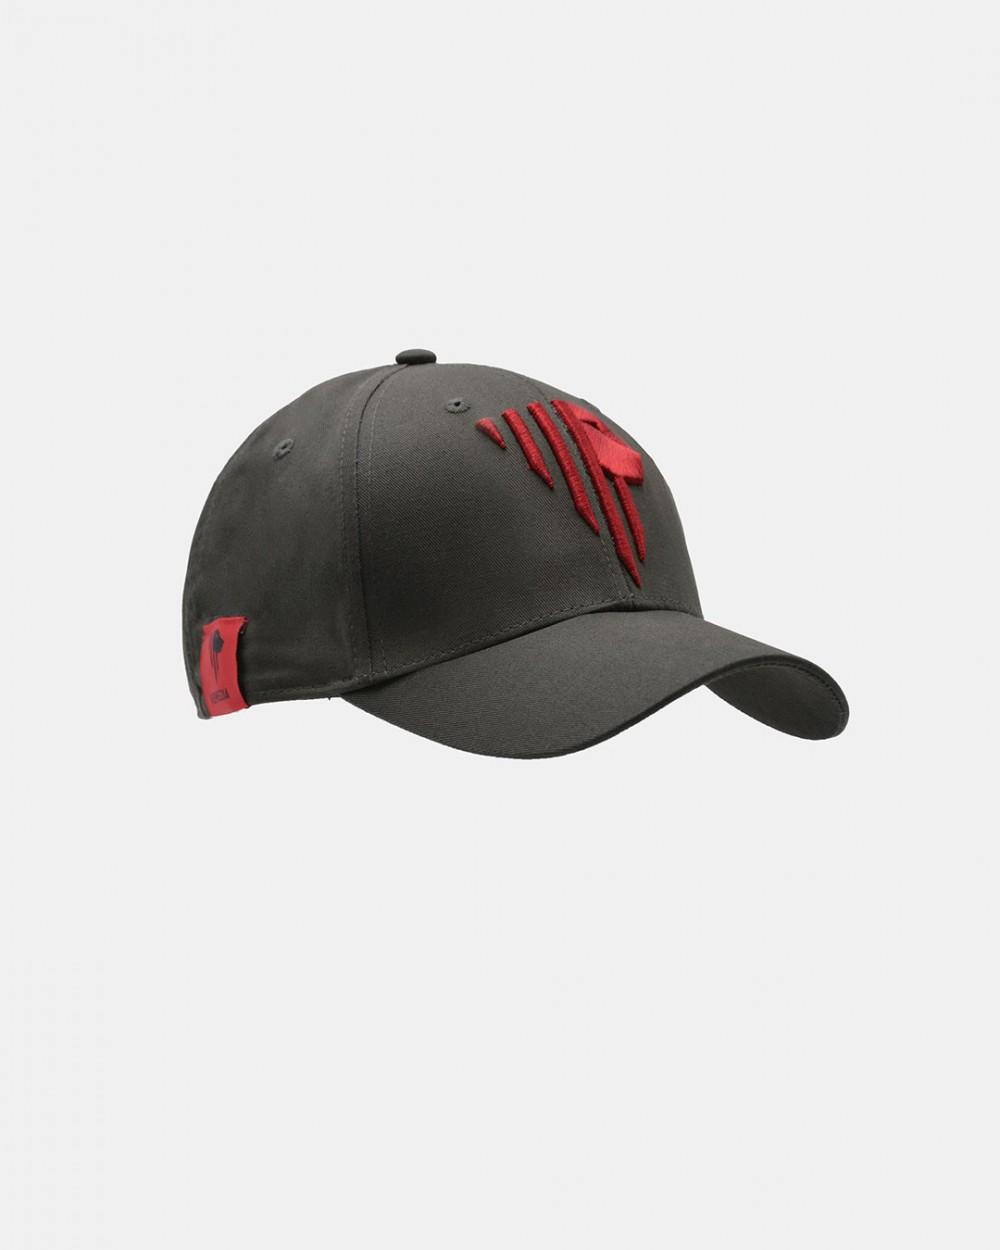 Dark grey baseball cap red stylised lion Venezia logotype front